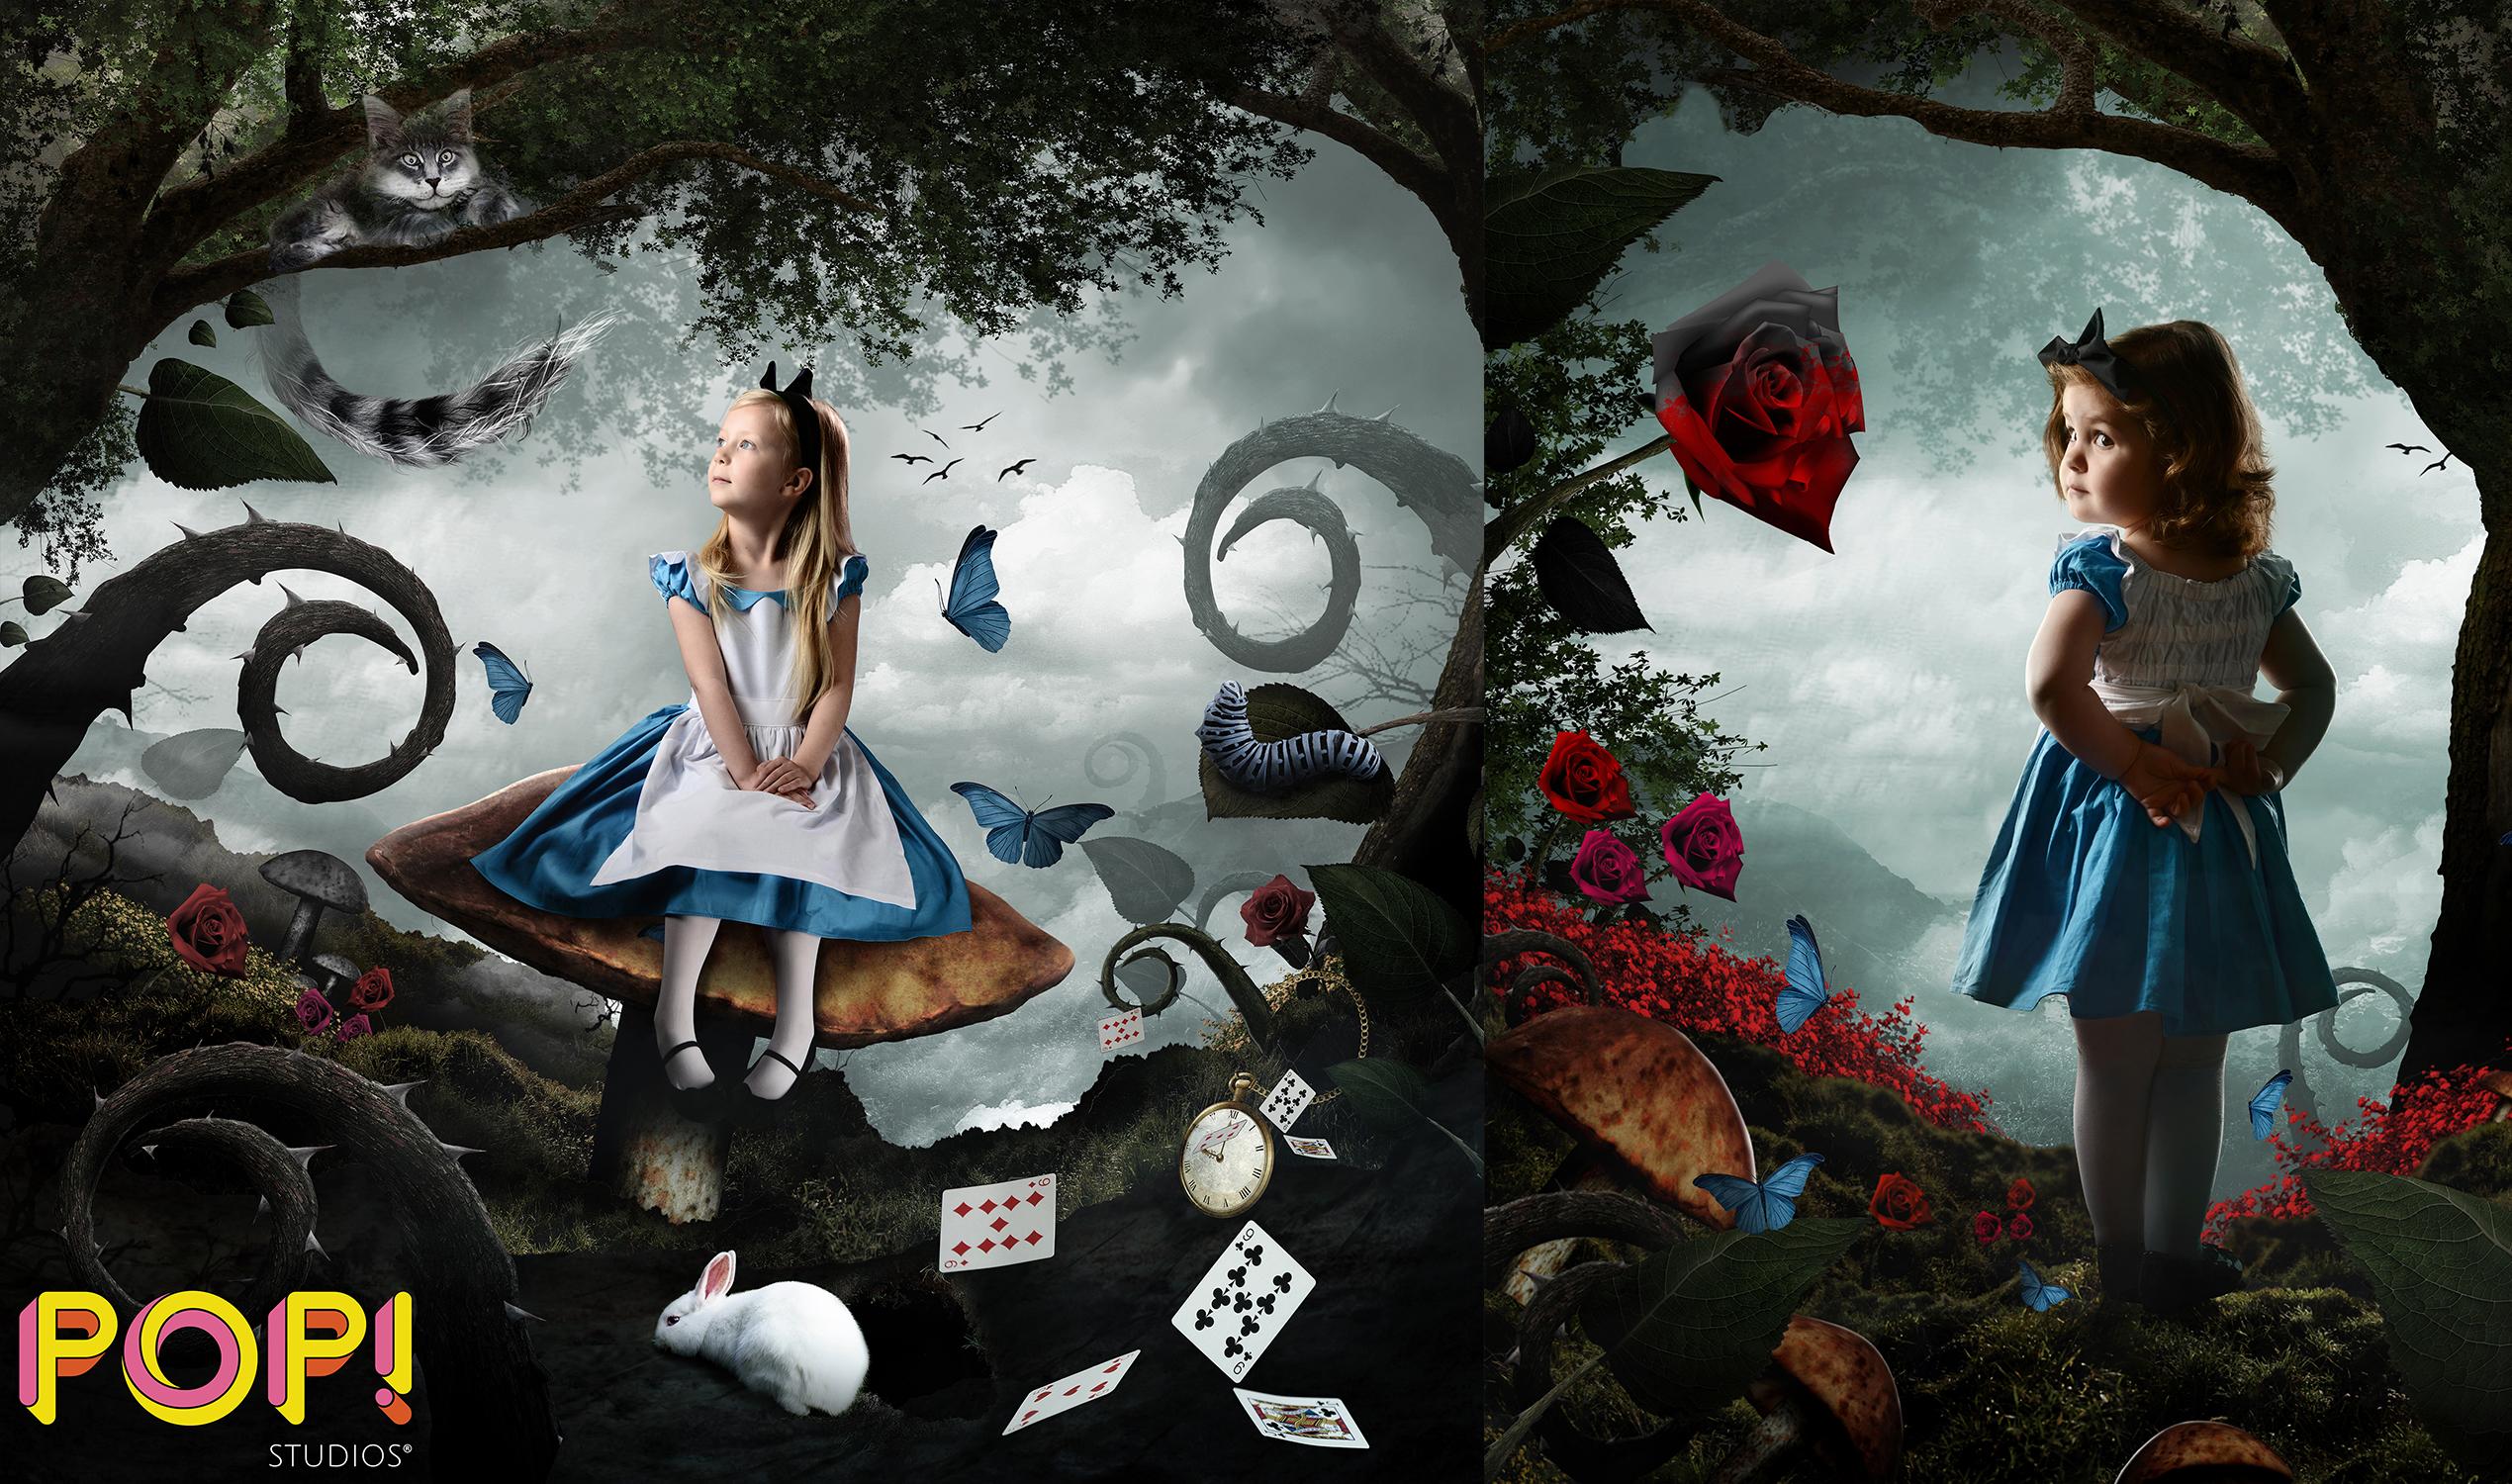 Alice in Wonderland themed shoot